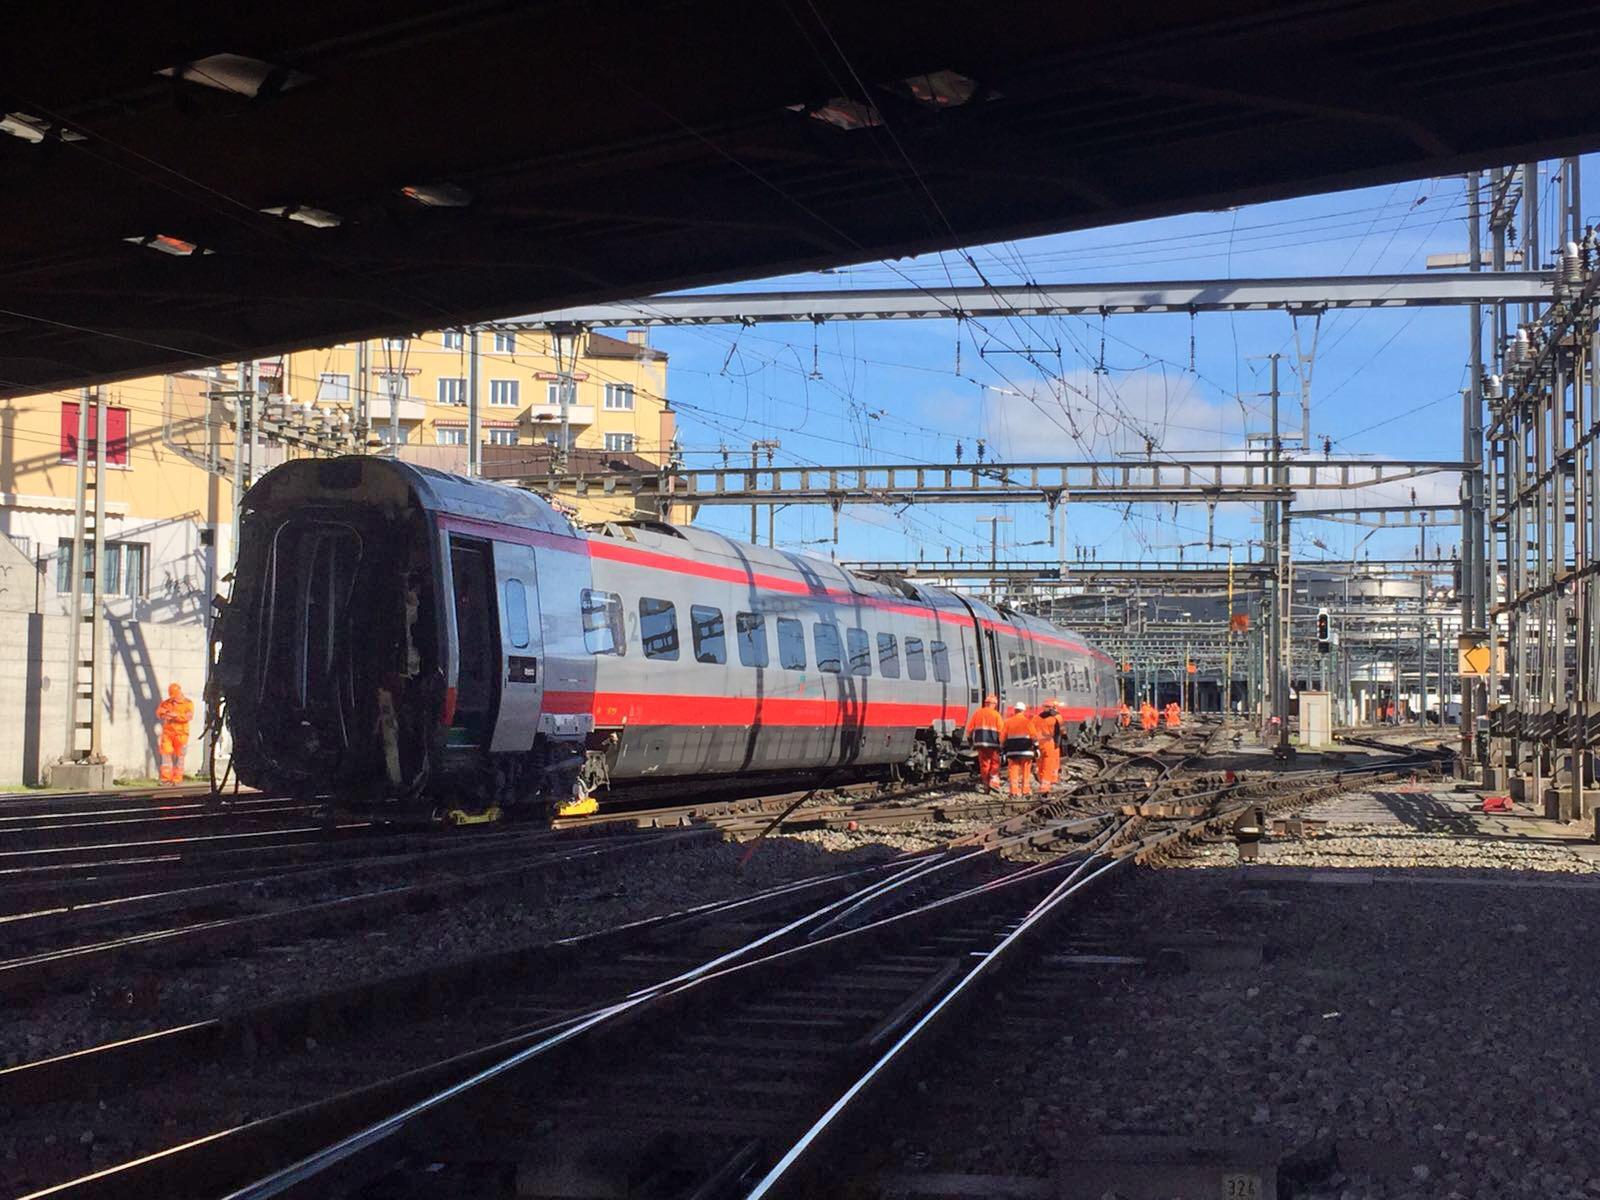 Bahnhof-bleibt-bis-Montagfr-h-gesperrt